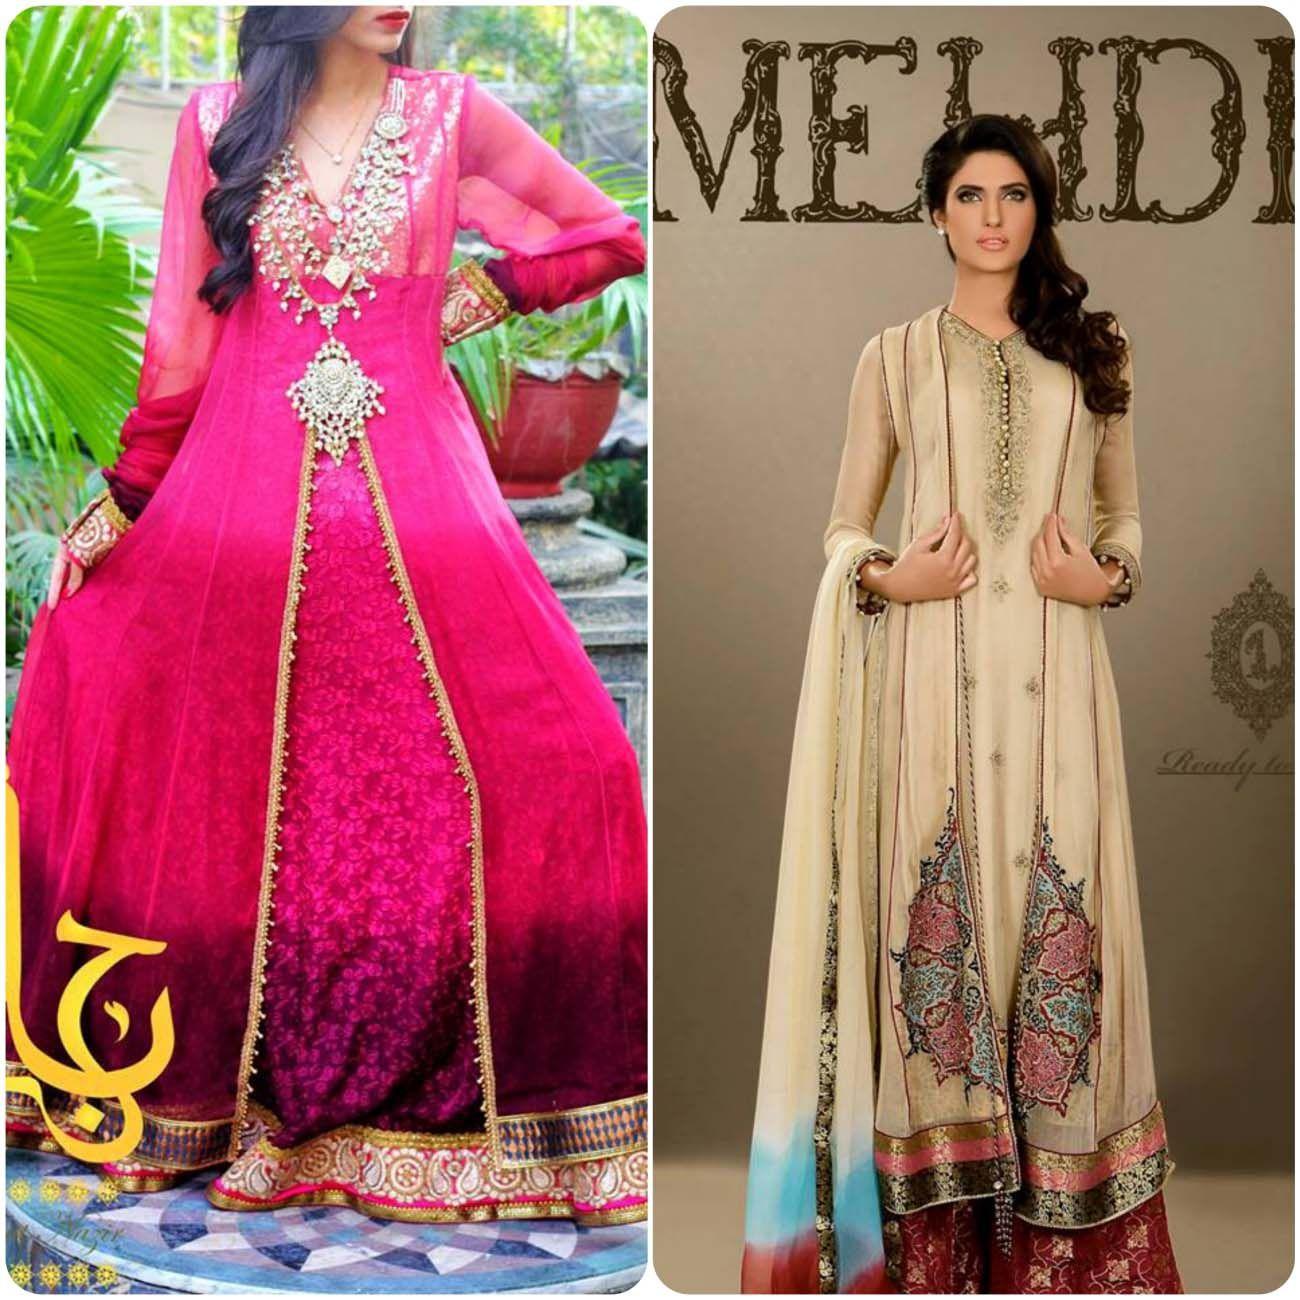 Double shirt dress design - Muslim Fashionhijab Fashionwomen S Fashionanarkali Bridalindian Dresses Anarkaliindian Wedding Dressespakistani Bridalindian Weddingsunique Dresses